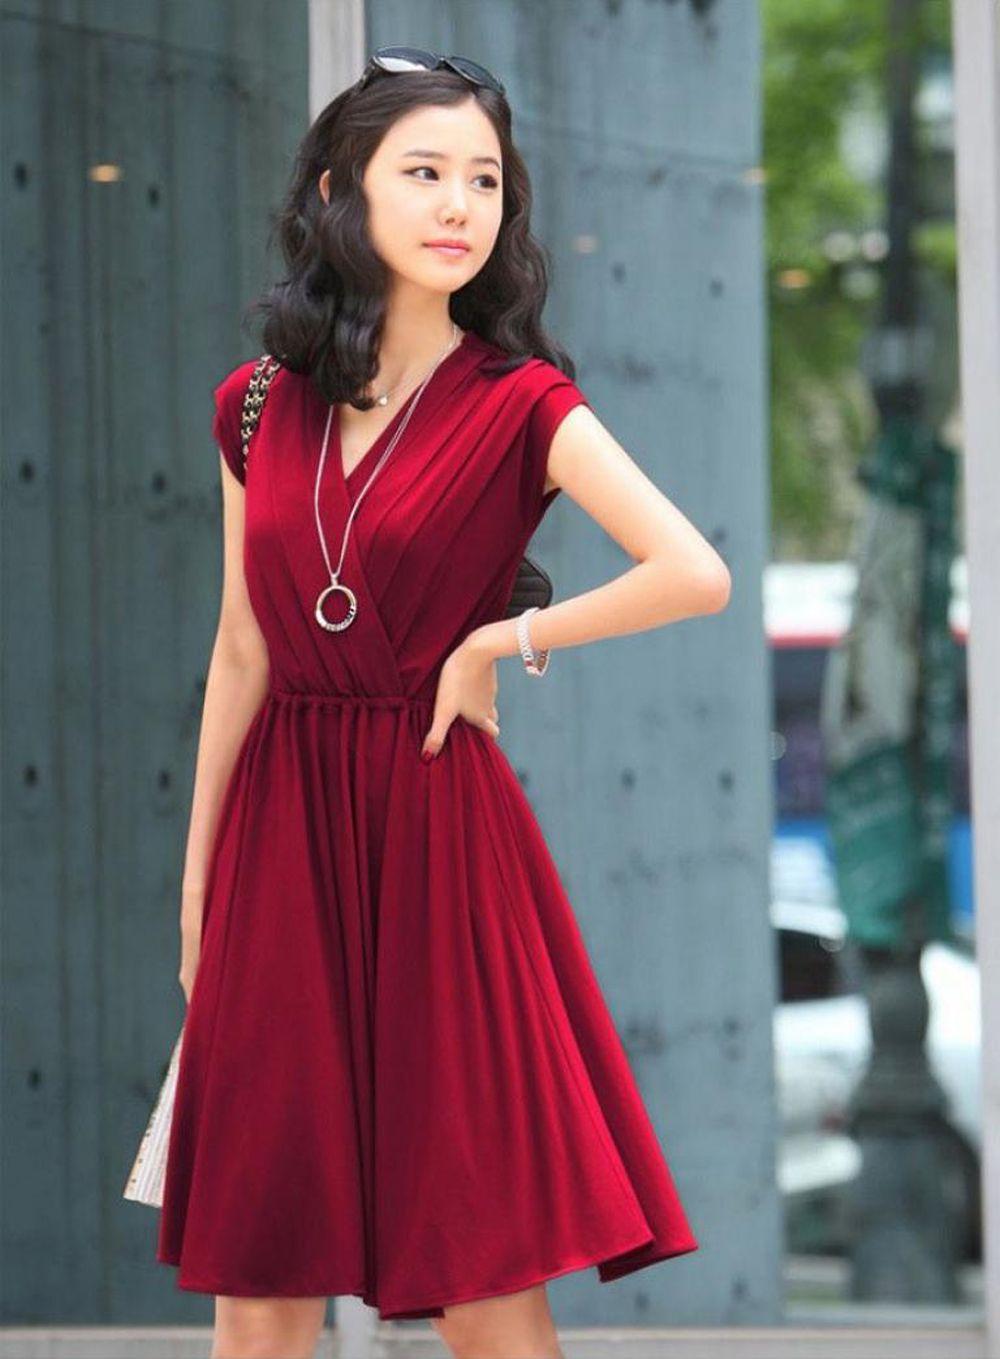 ropa modesta | Ropa Modesta Femenina / Modesty Woman | Pinterest ...